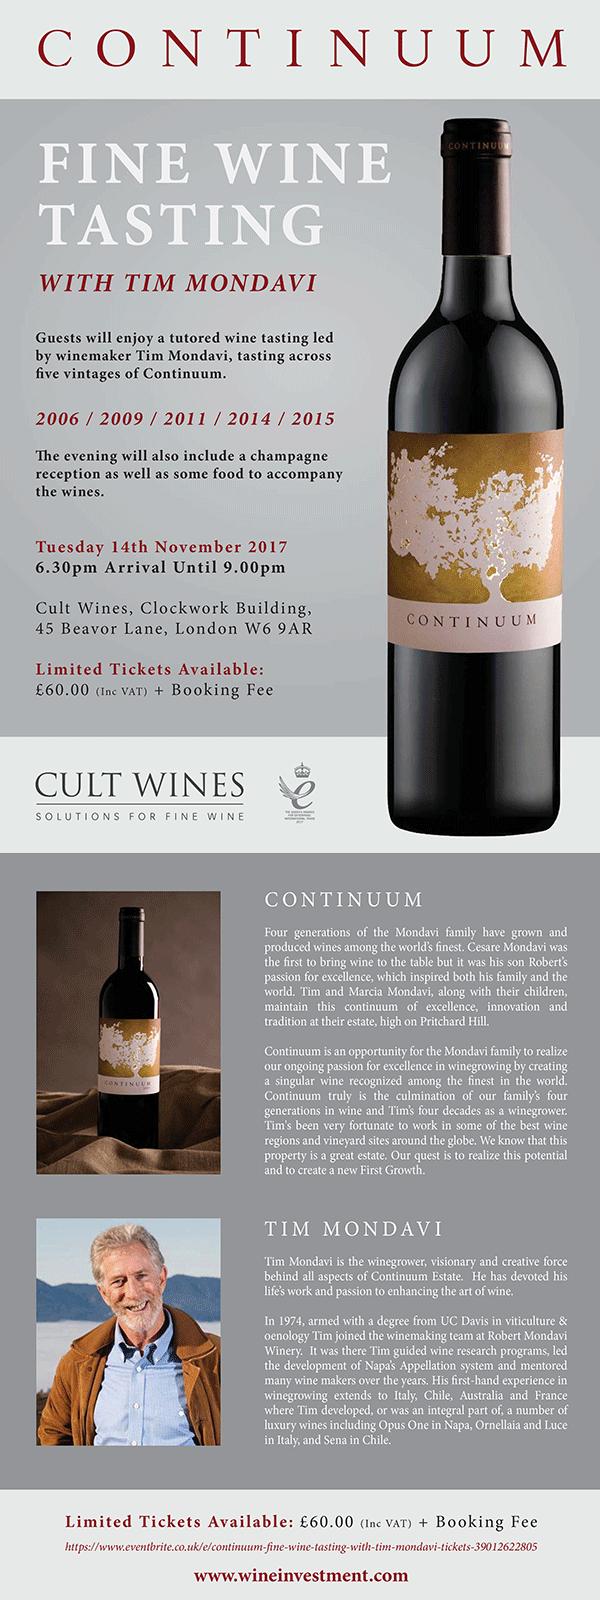 Continuum Fine Wine Tasting with Tim Mondavi